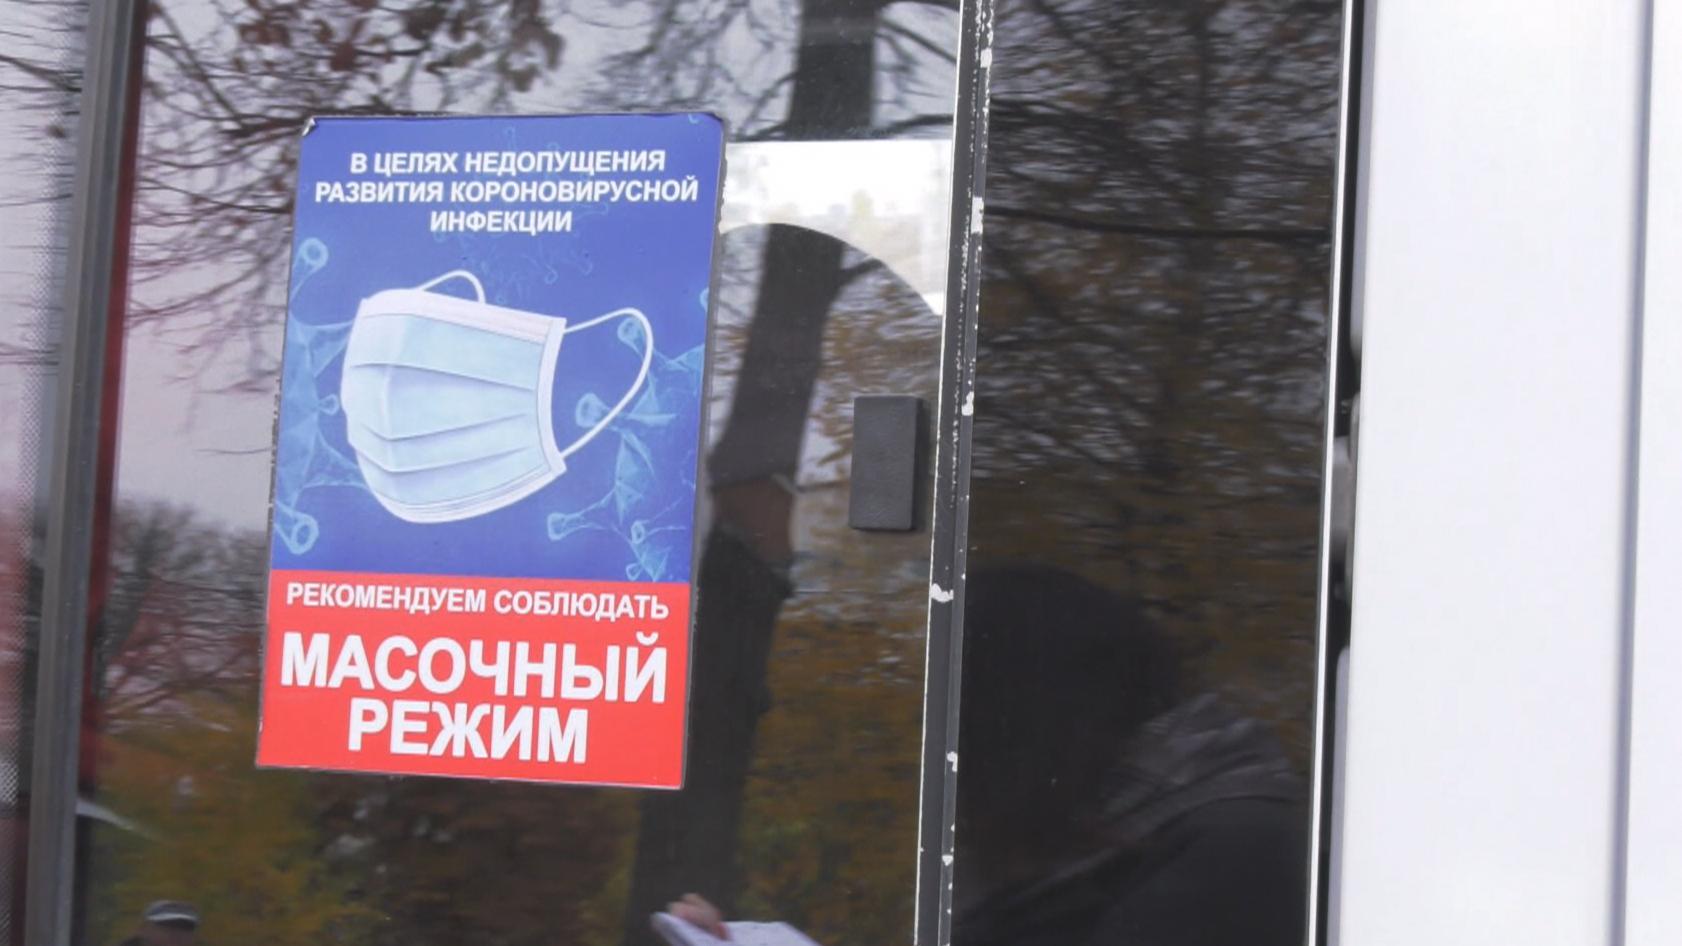 masochnyj rejd - Масочный рейд в Витебске (видео)